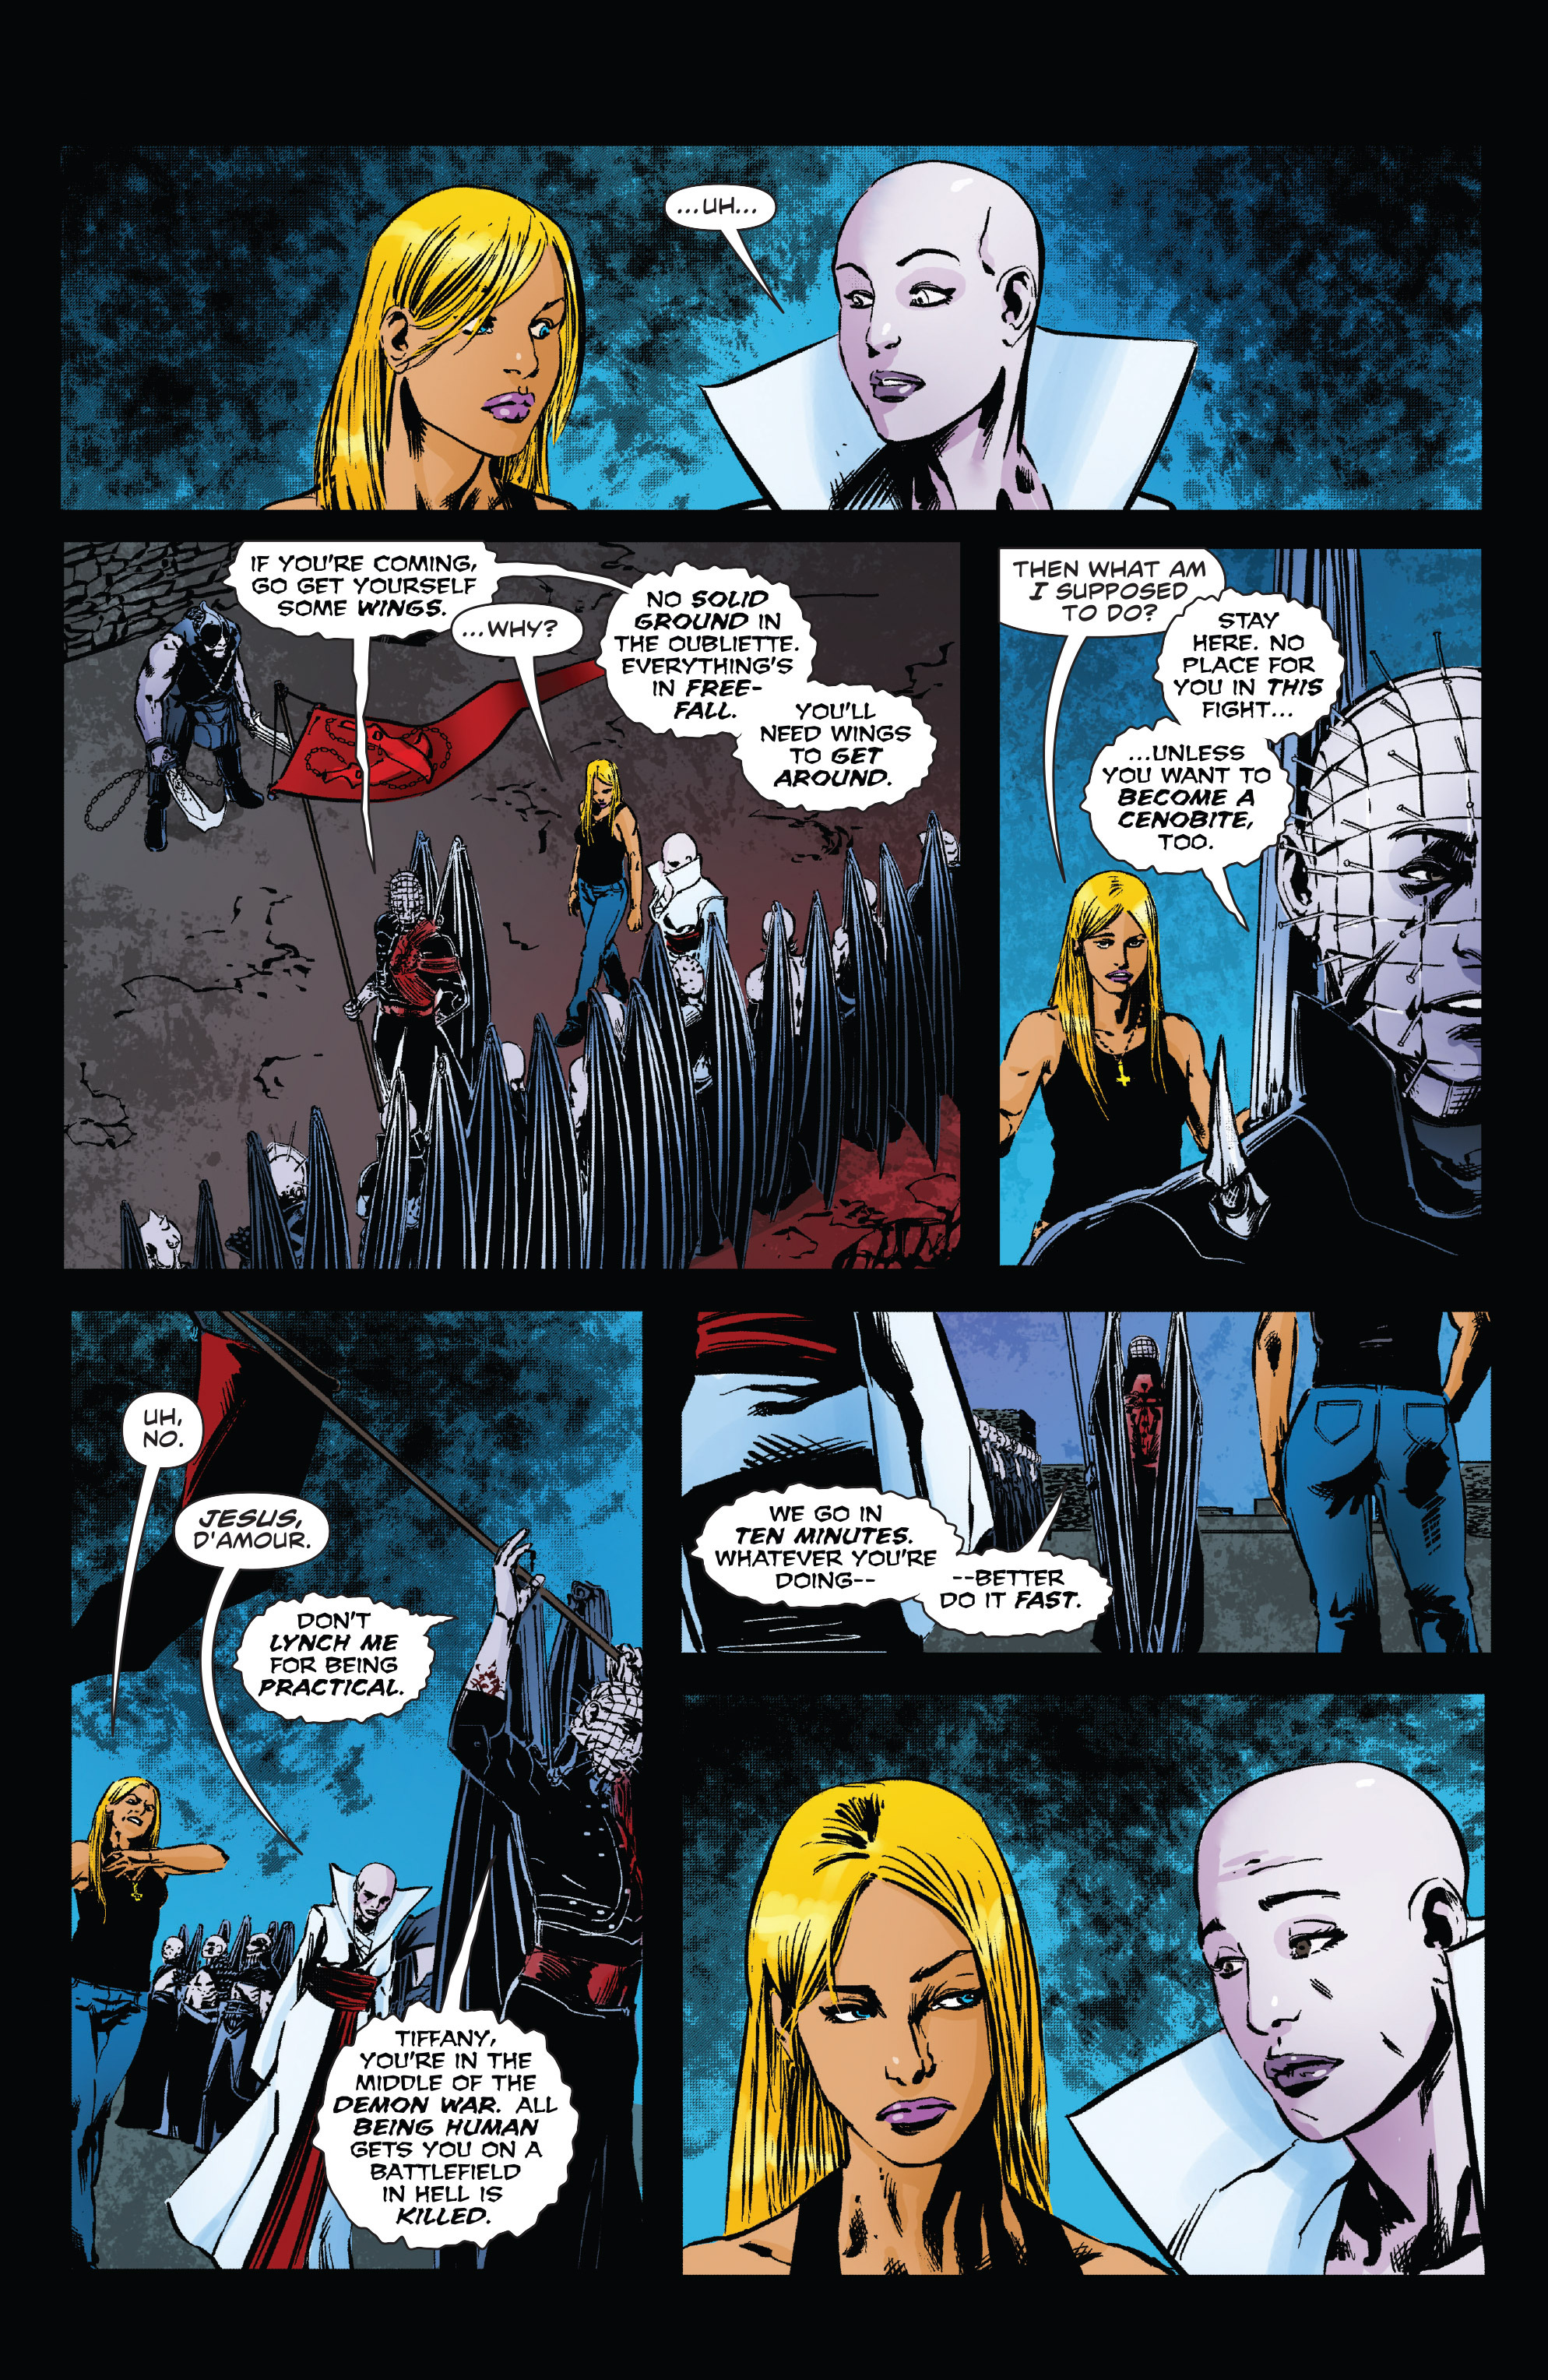 Read online Clive Barker's Hellraiser: The Dark Watch comic -  Issue # TPB 3 - 63